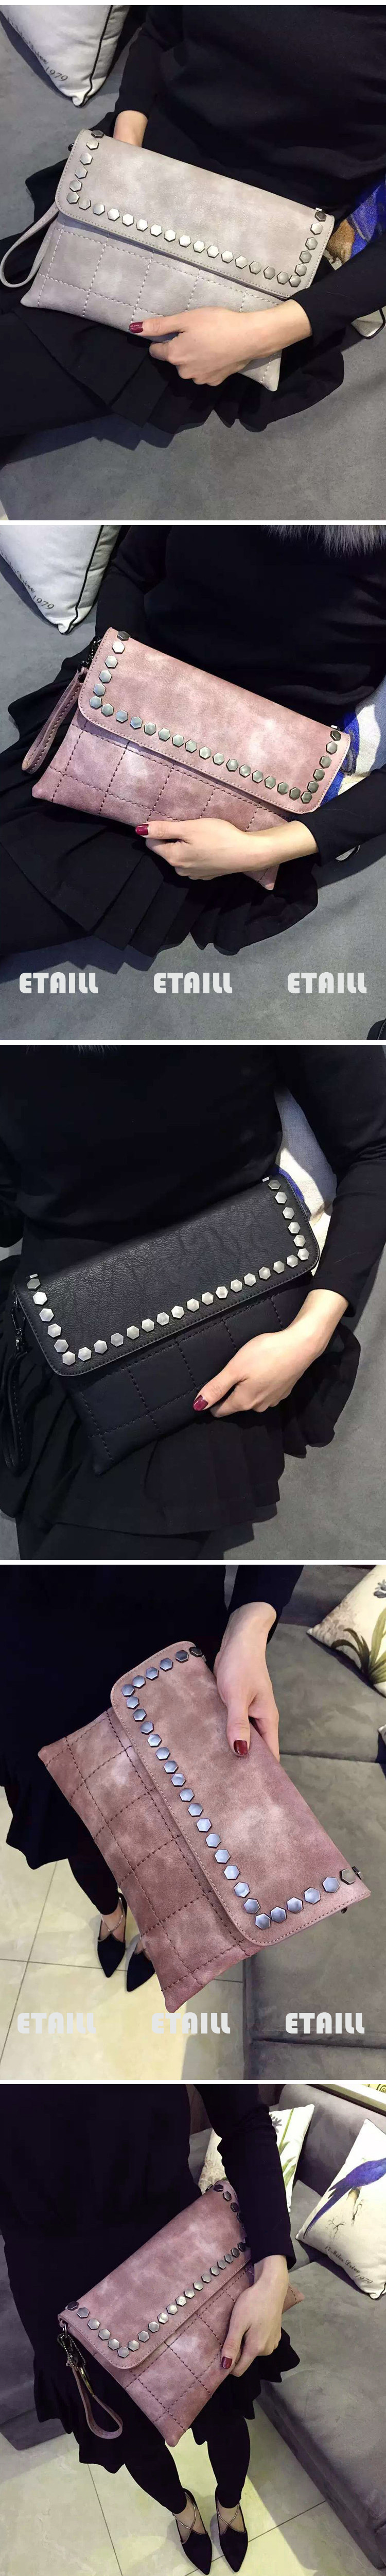 Genuine Leather Bags Rivet Messenger Bags